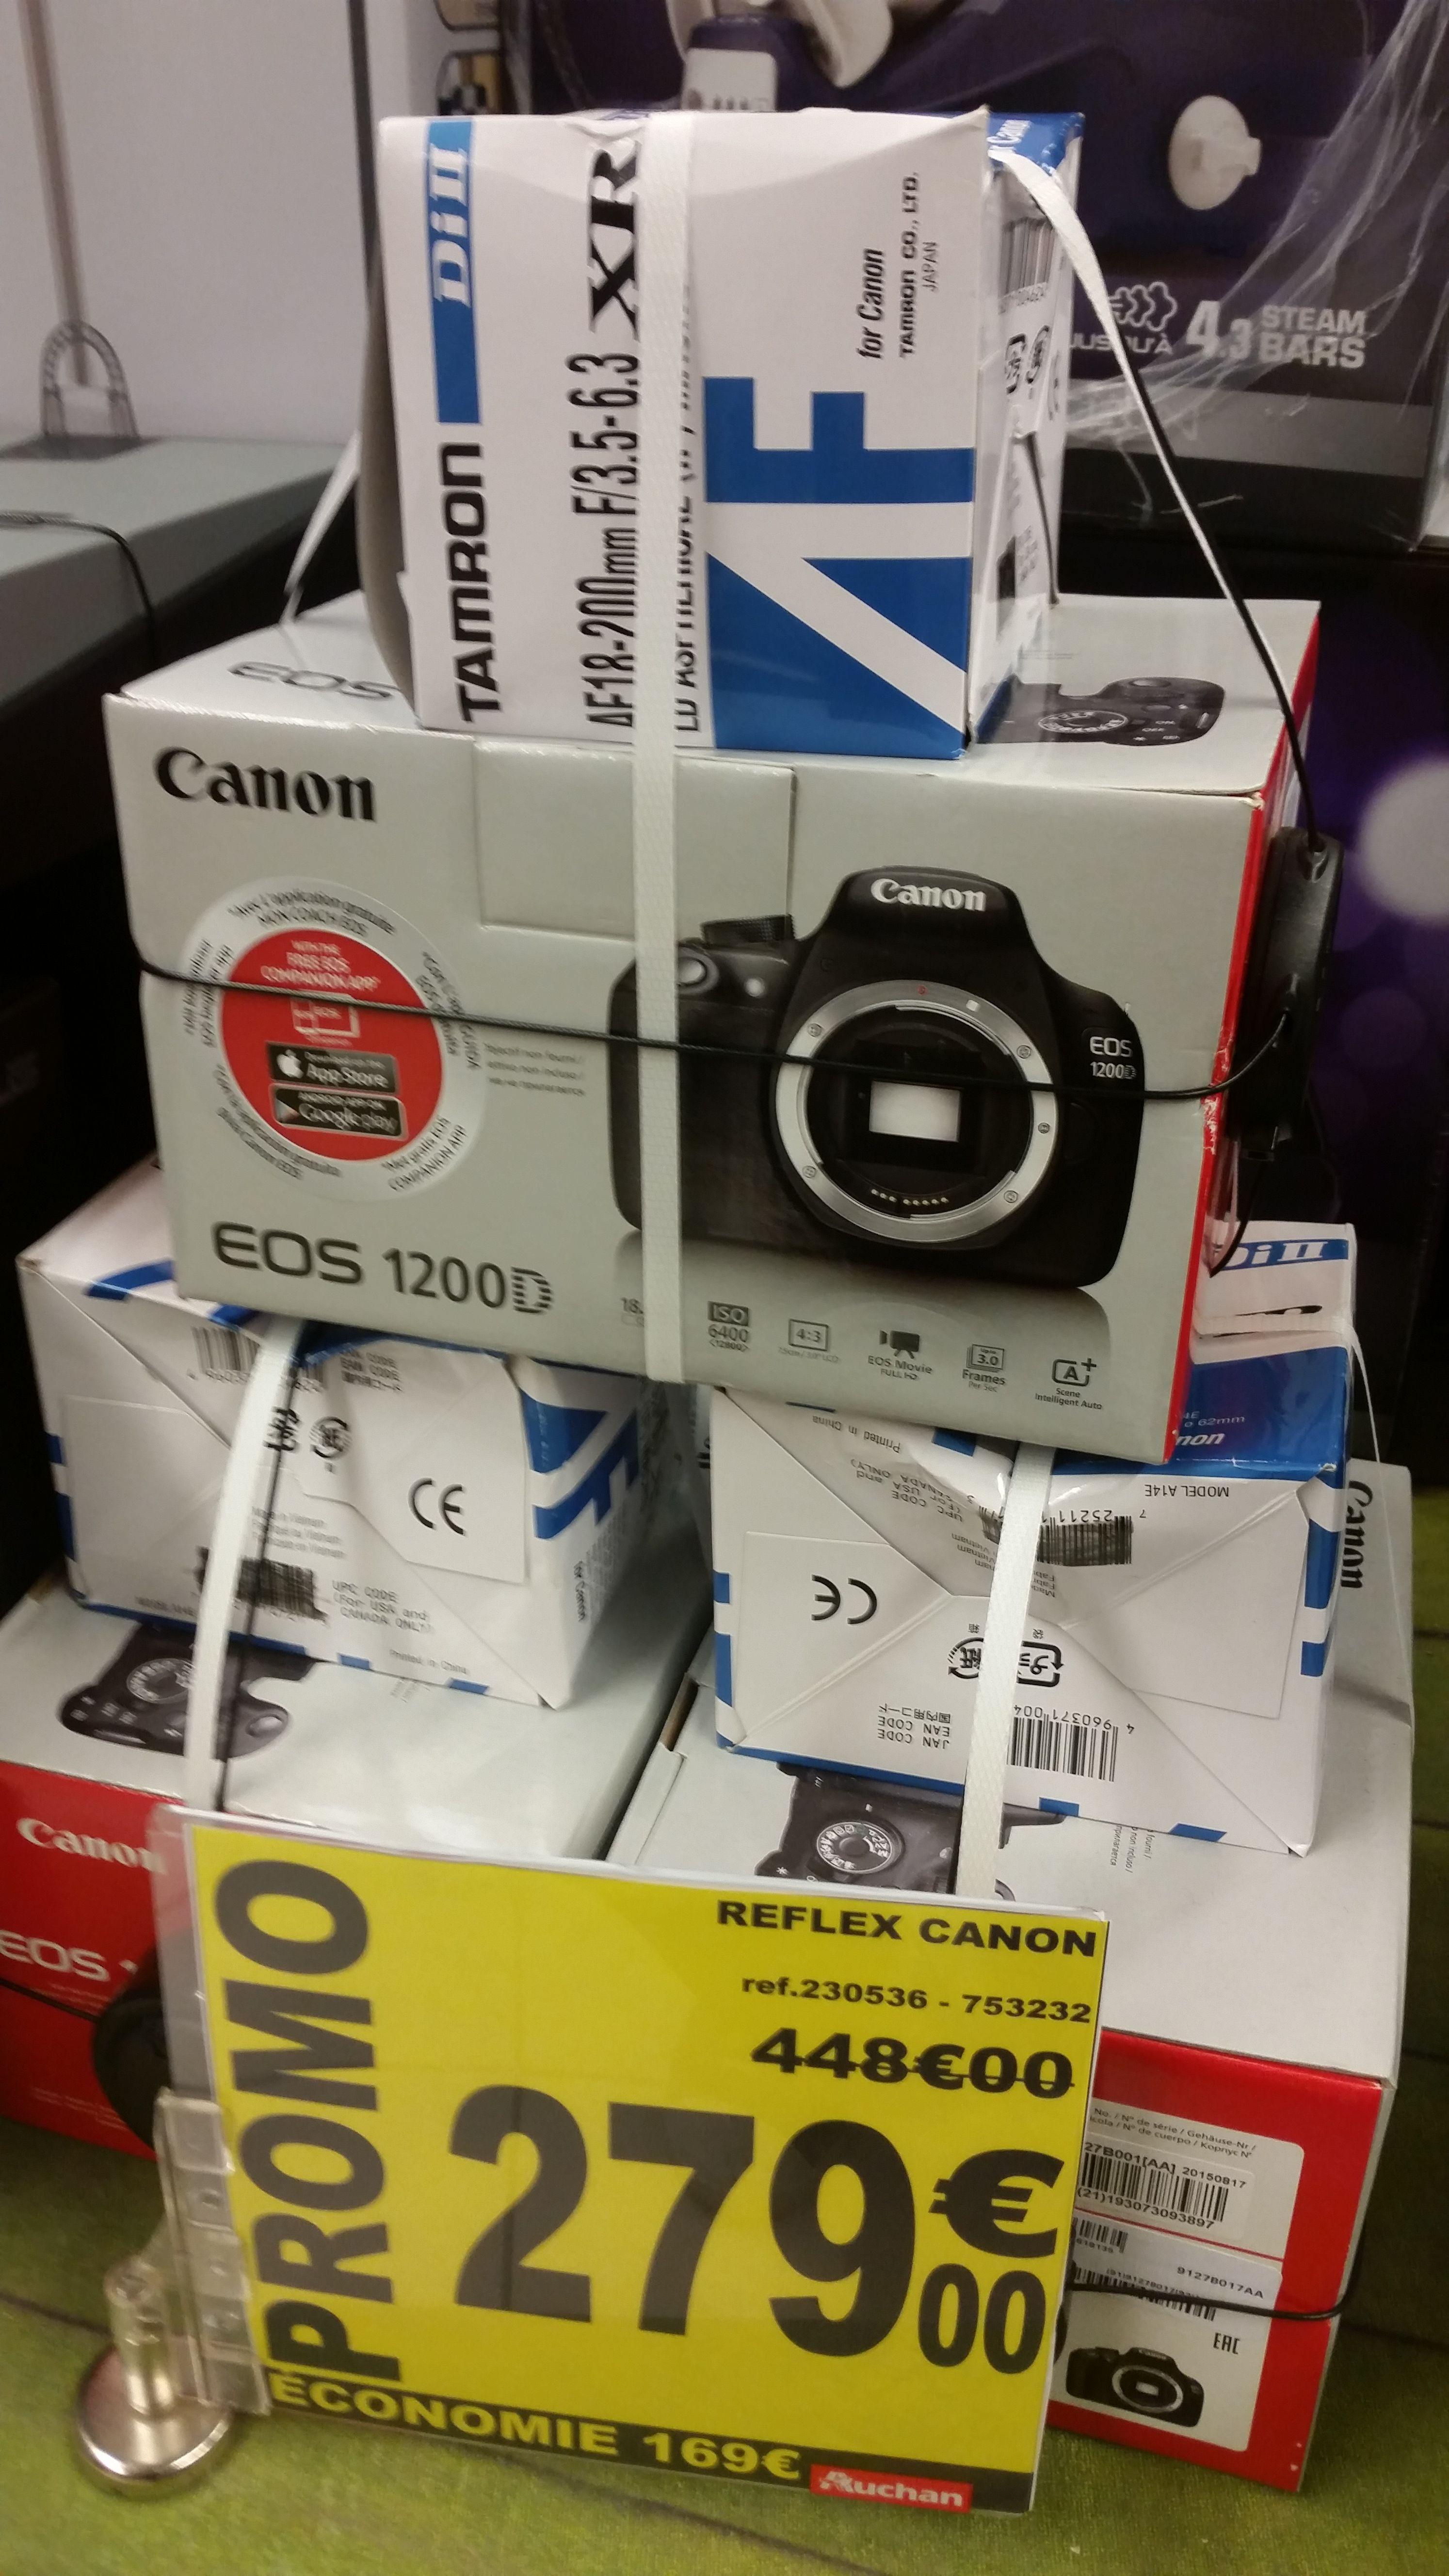 Appareil Photo Reflex Canon EOS 1200D + Objectif Tamron 18/200